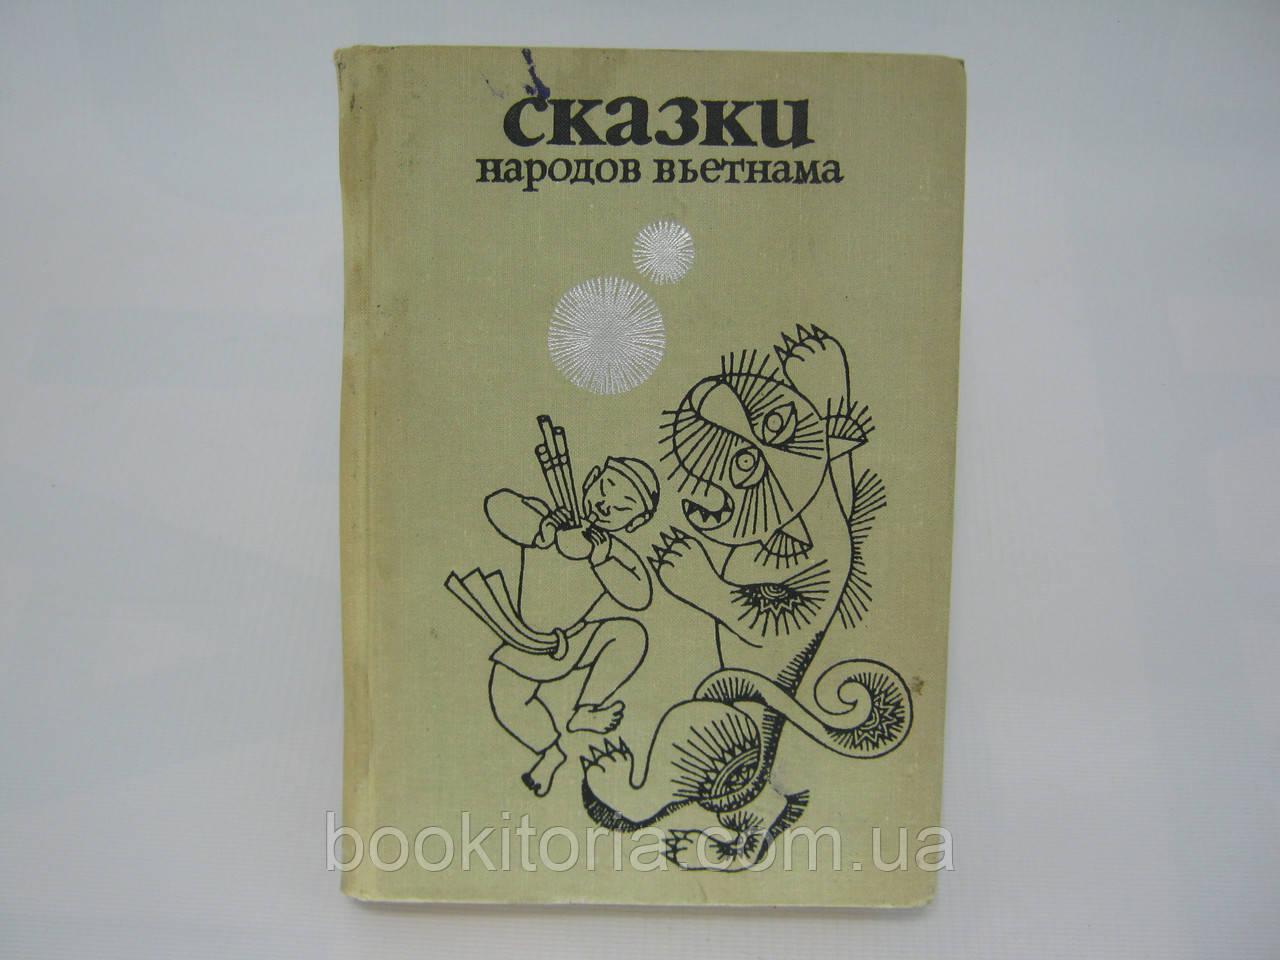 Сказки народов Вьетнама (б/у).